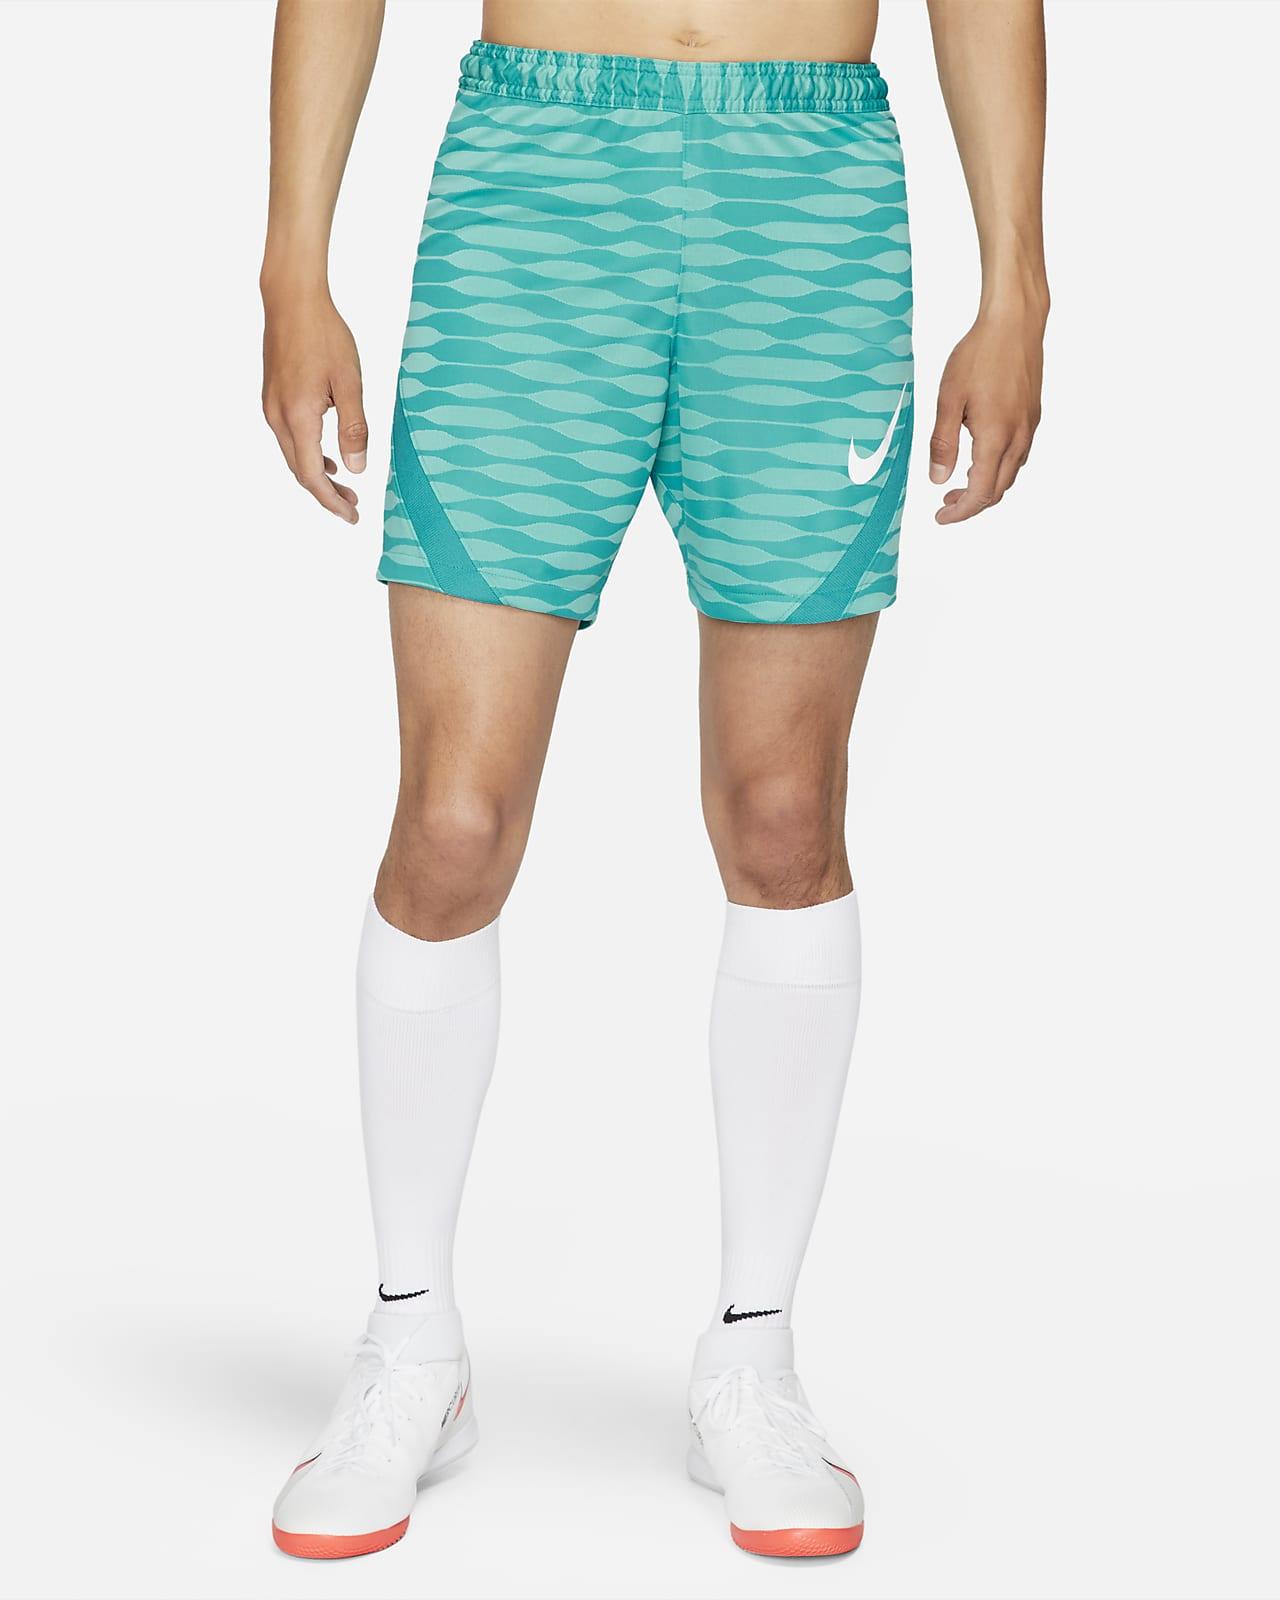 Nike Dri-FIT Strike Men's Knit Soccer Shorts